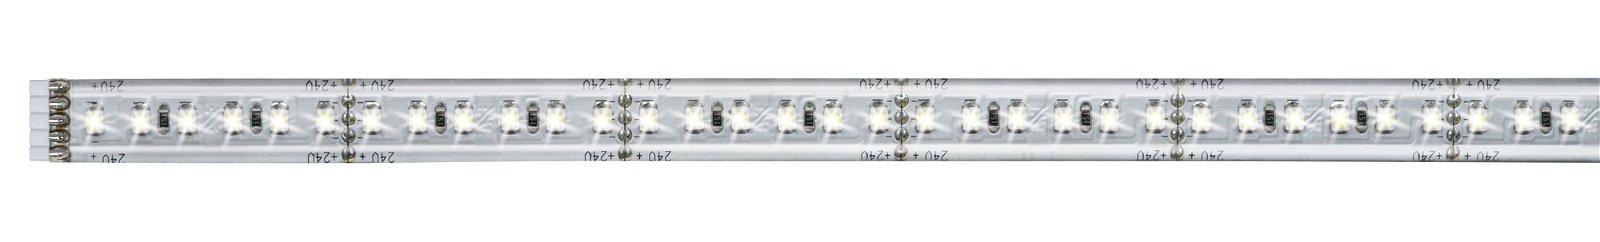 MaxLED 1000 LED Strip Daglichtwit 0,5m gecoat 6W 1100lm/m 6500K